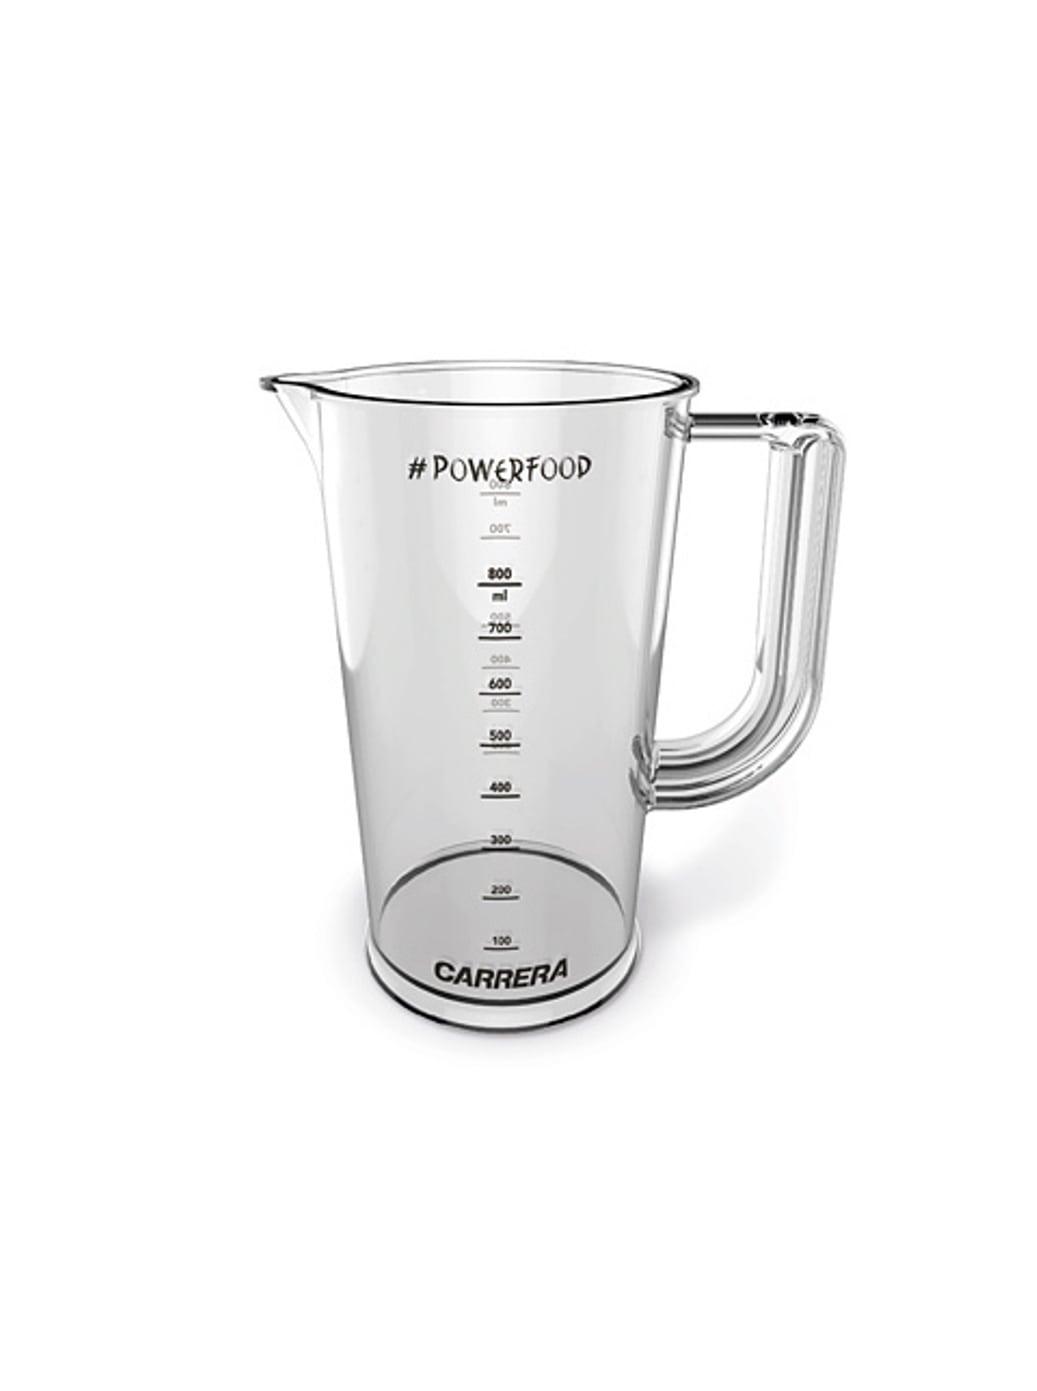 Онлайн каталог PROMENU: Чаша мерная для ручного блендера Carrera Carrera 16016012